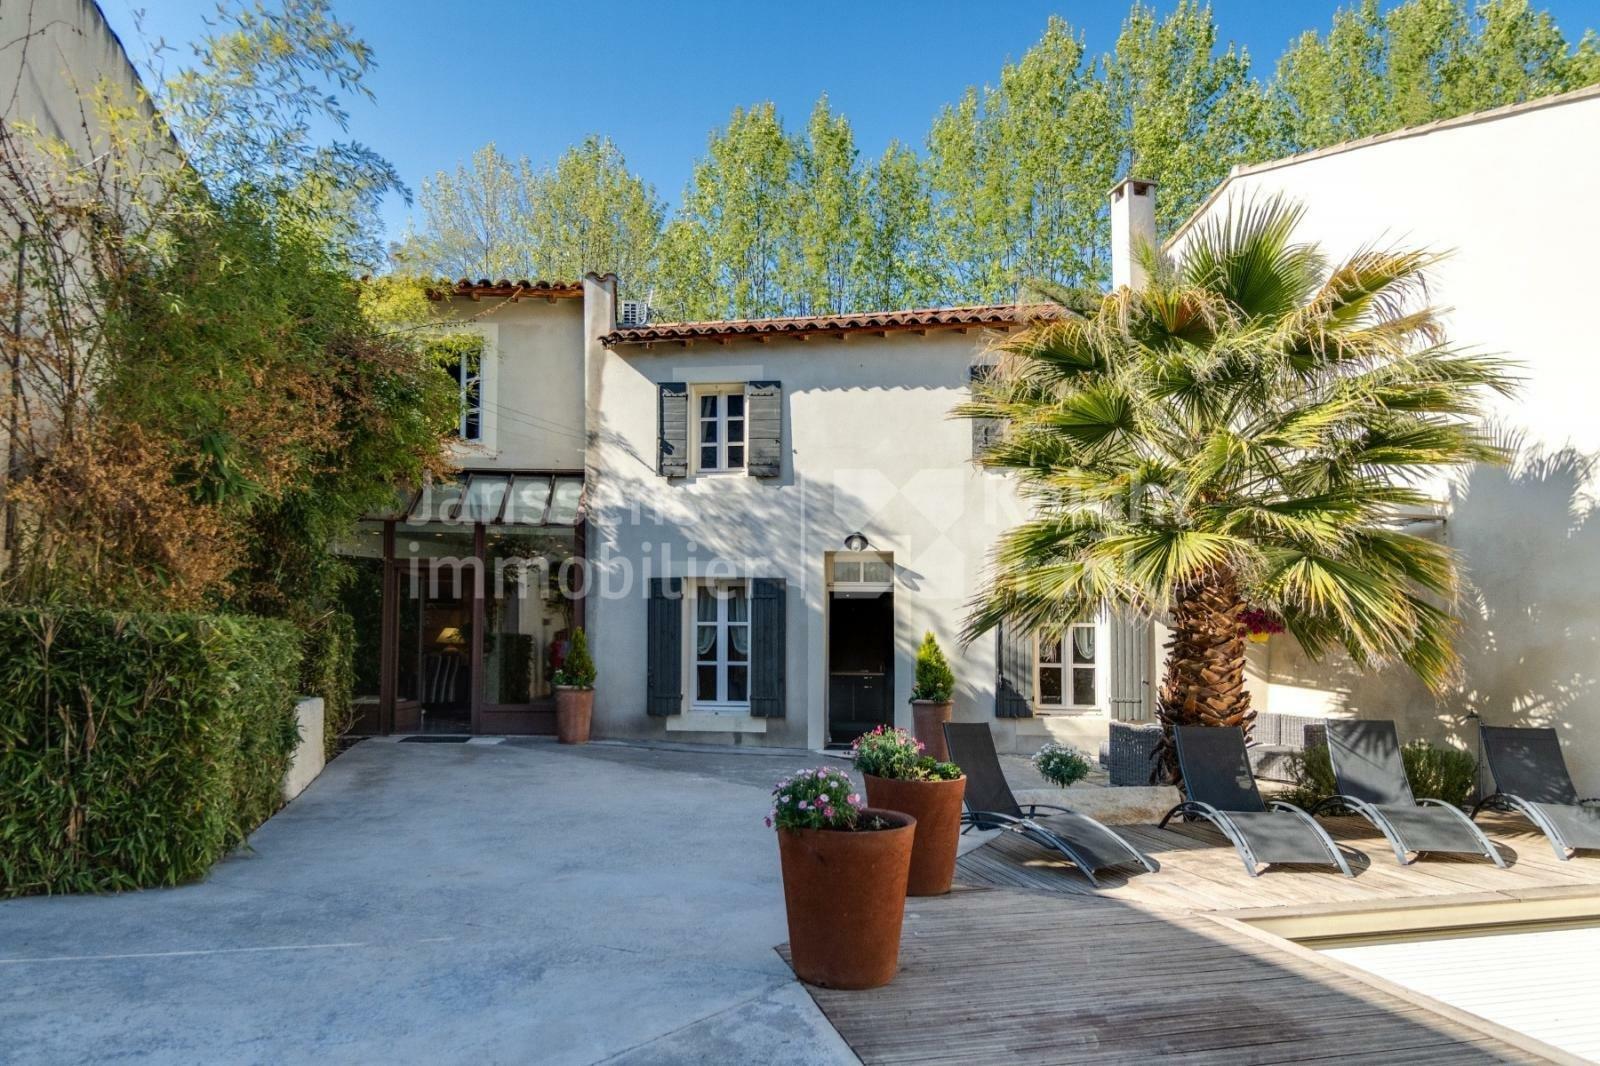 Villa in Eyragues, Provence-Alpes-Côte d'Azur, France 1